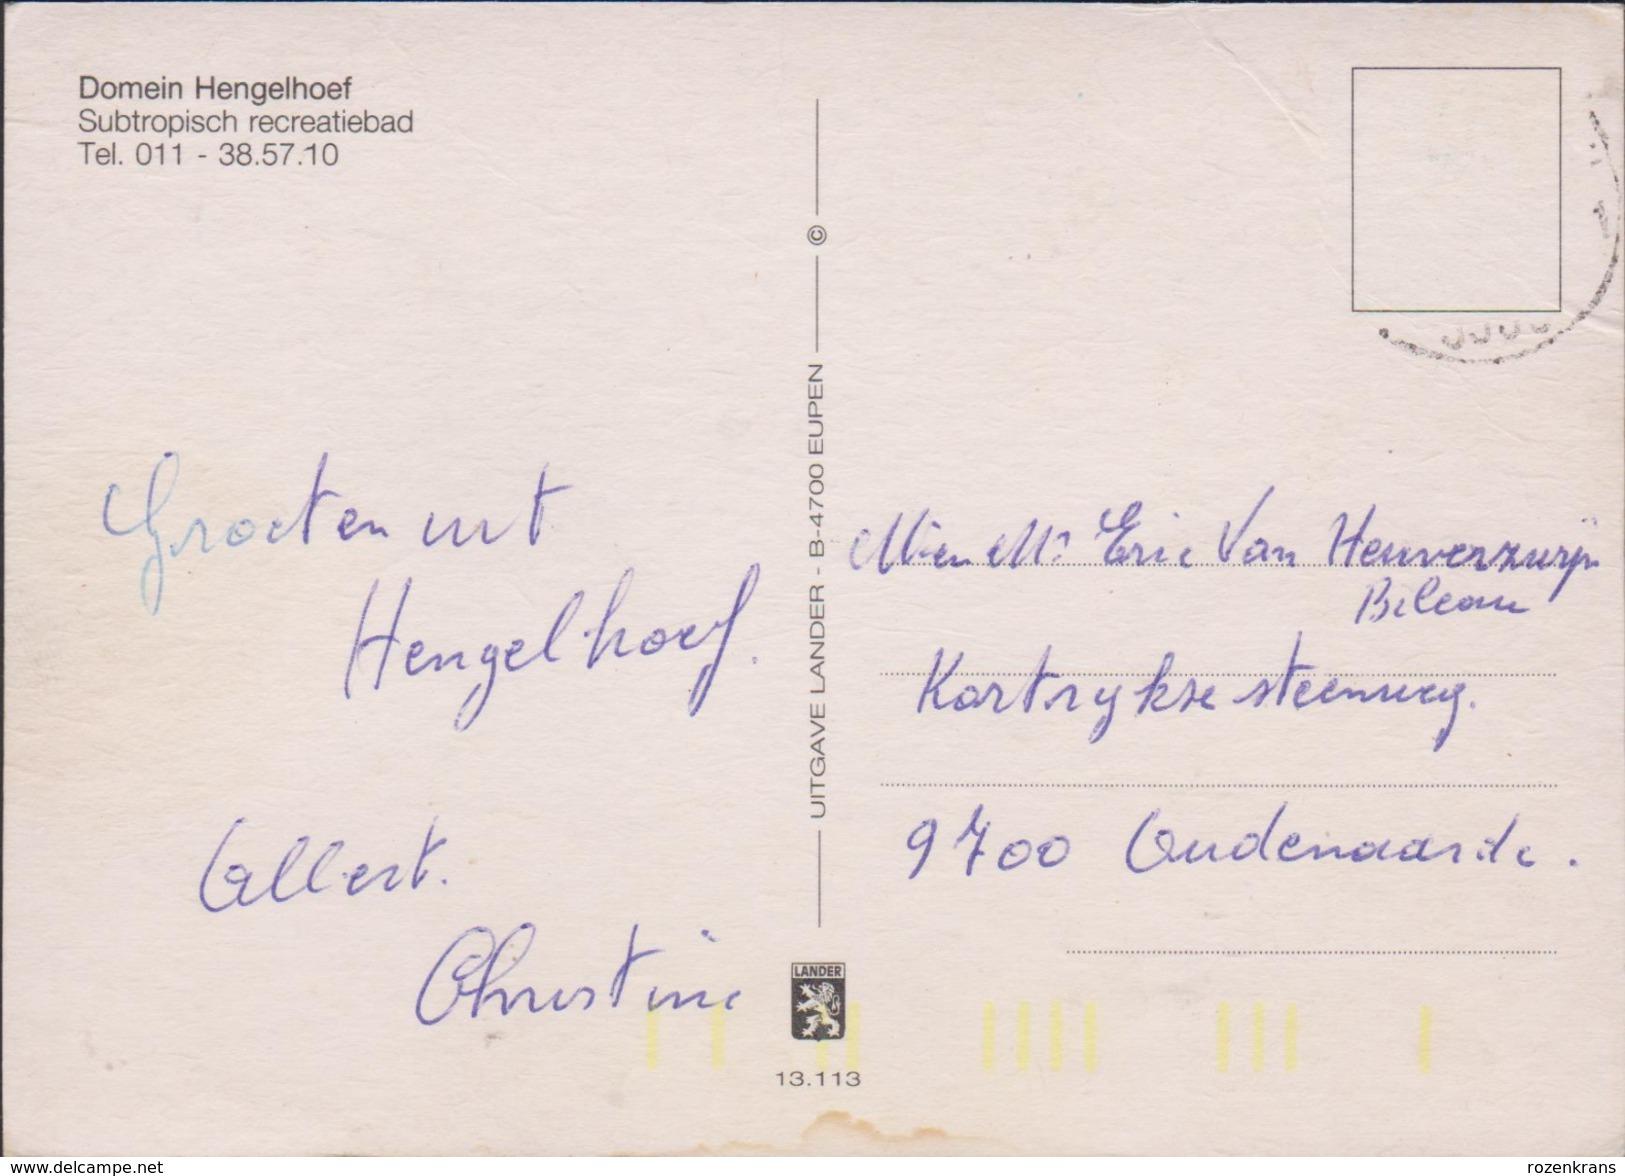 Grote Kaart Domein Subtropisch Recreatiebad Hengelhoef Houthalen Helchteren Limburg (kreuk) - Houthalen-Helchteren